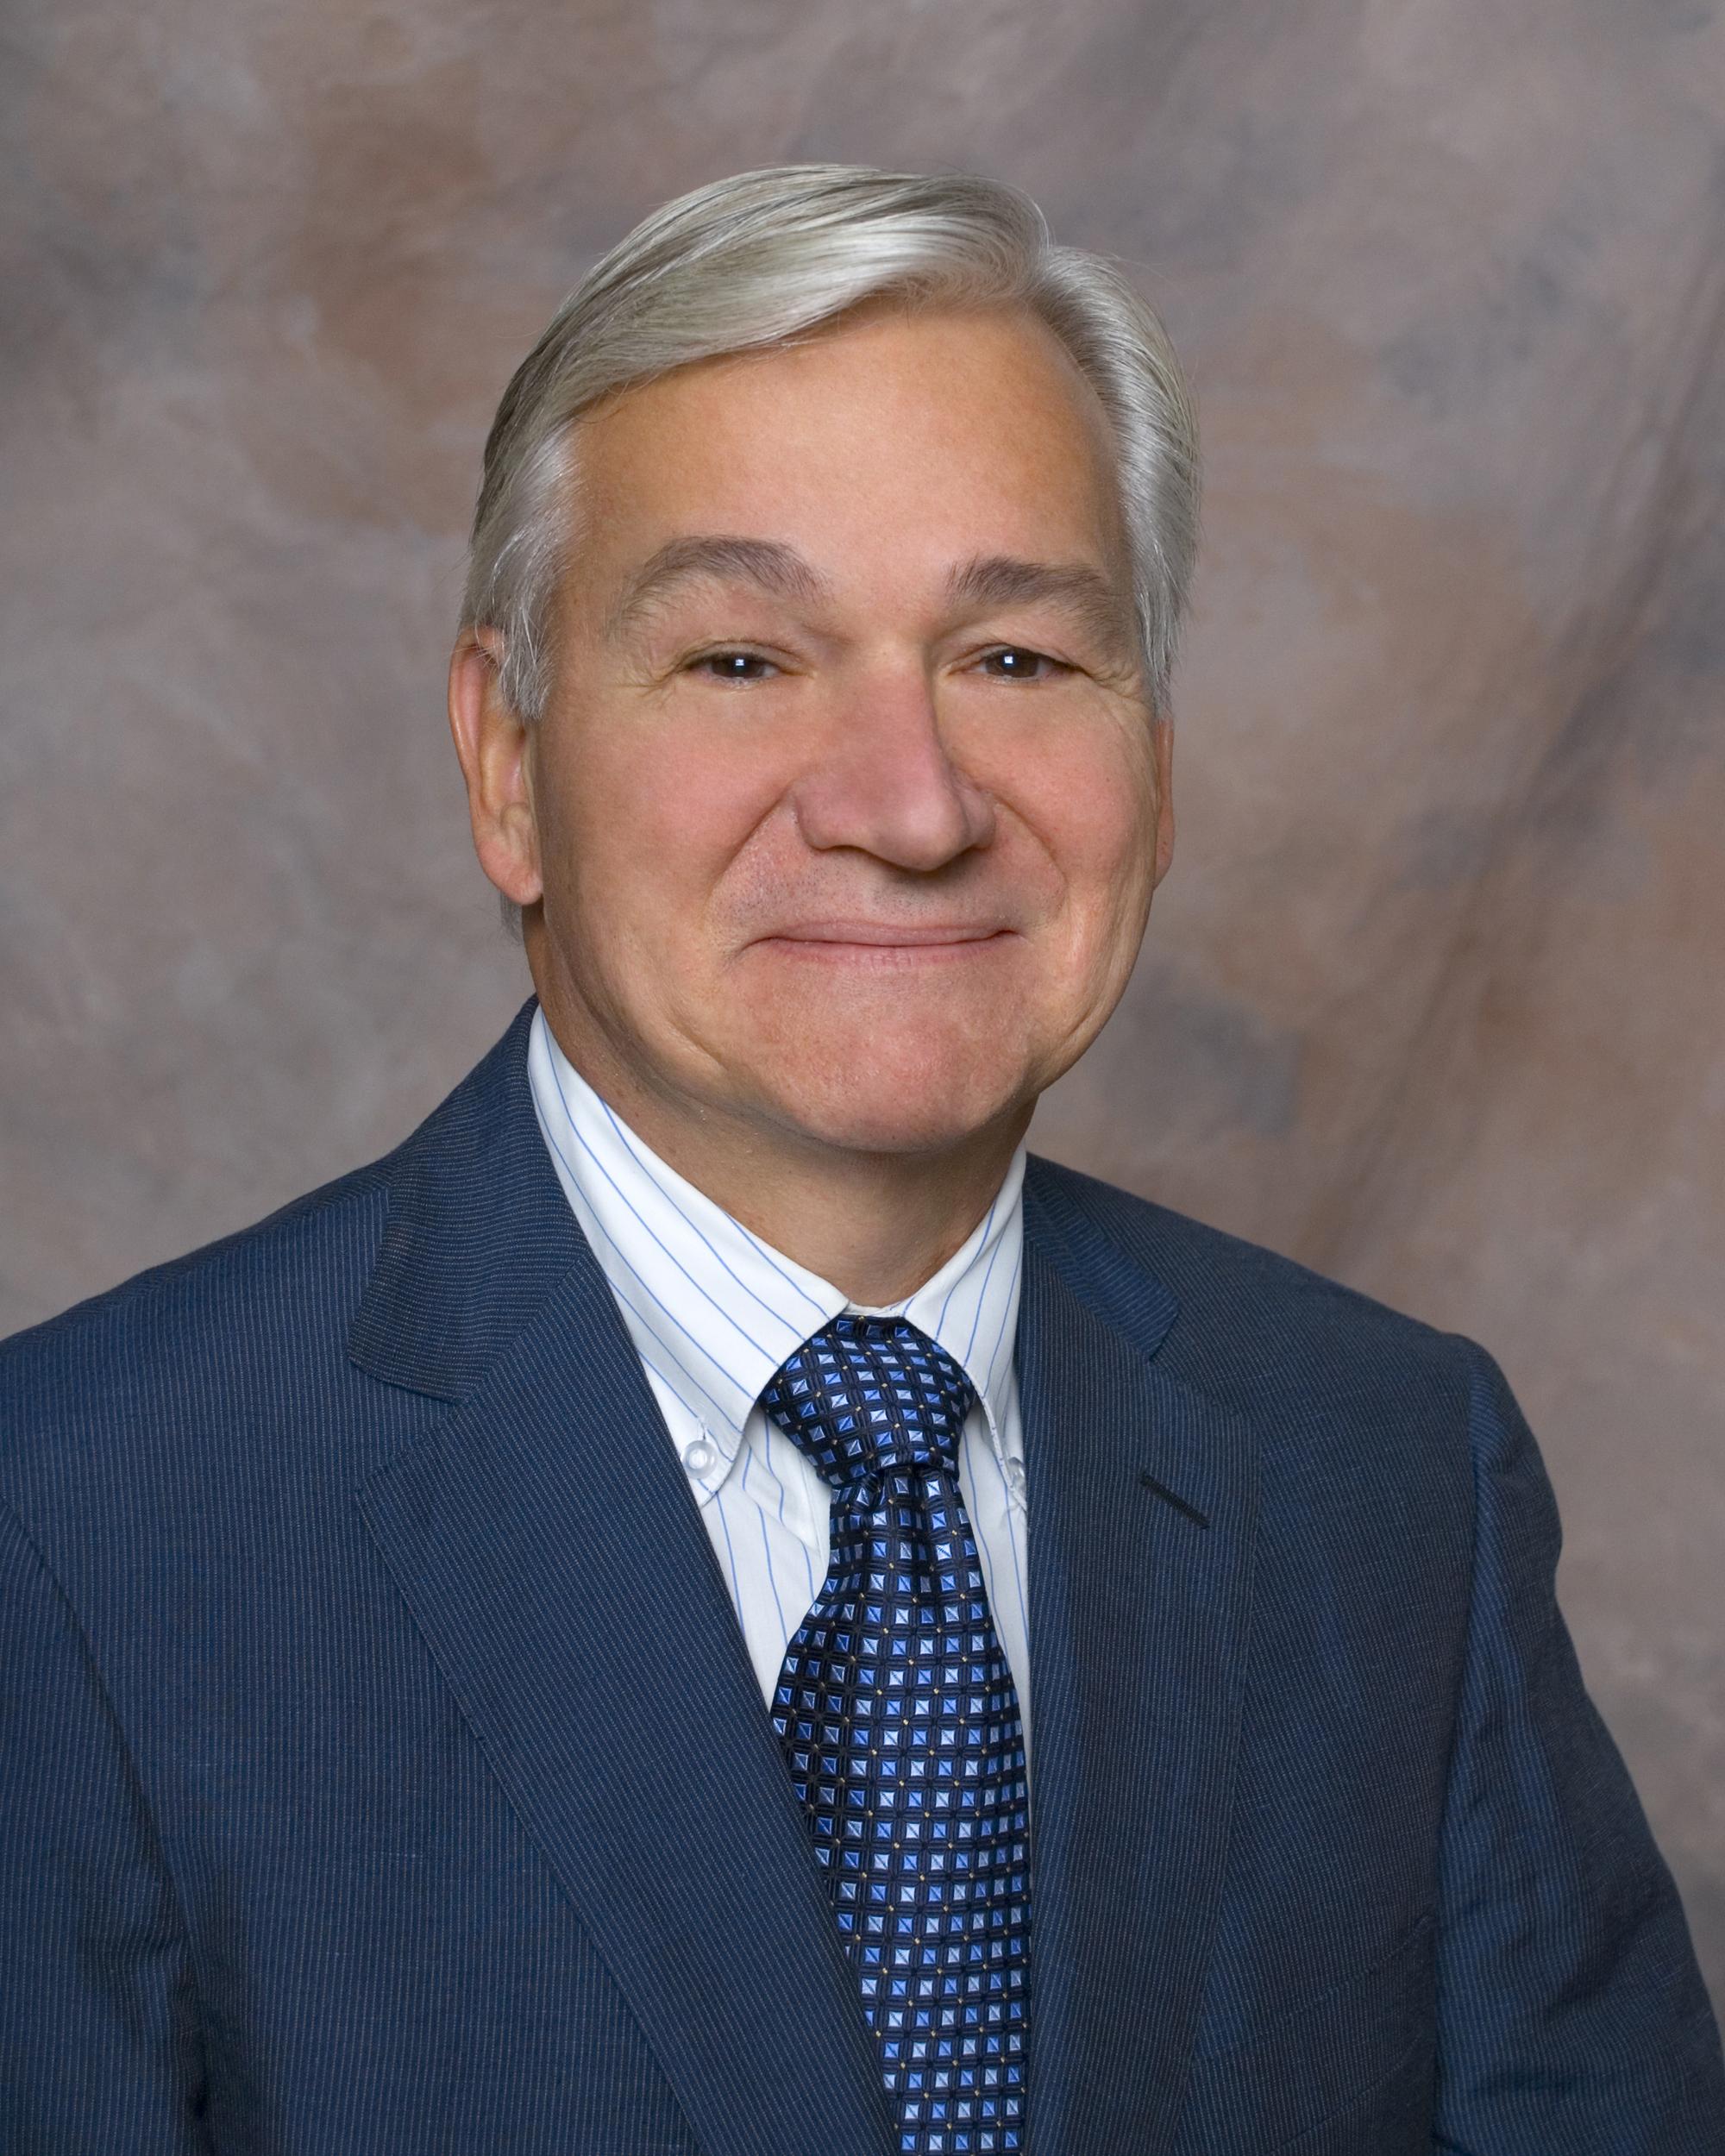 Dr. Leighton Johnson